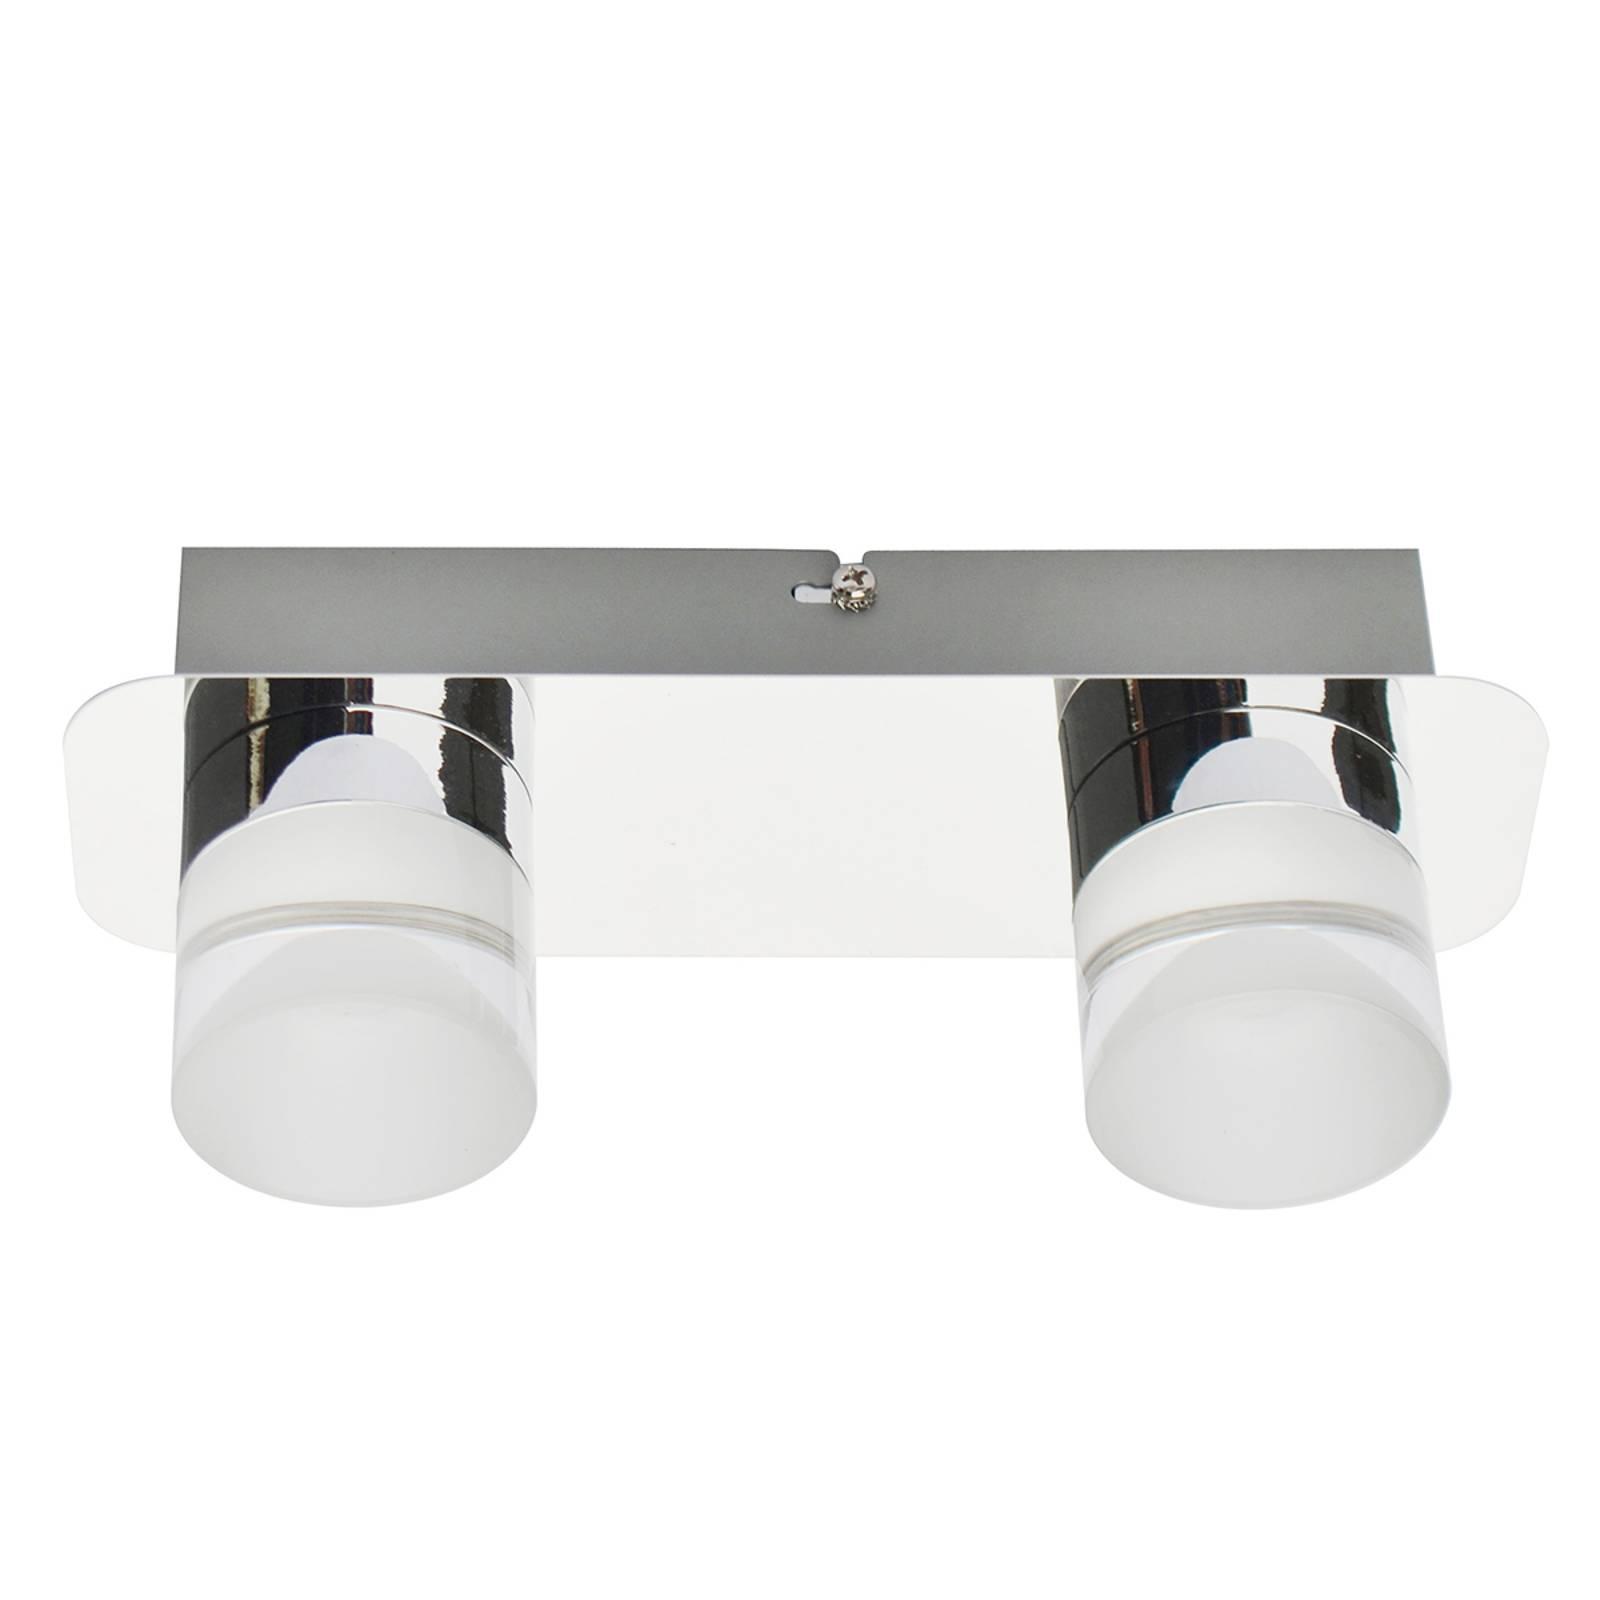 LED-kattovalaisin Stefanie, 2-lamppuinen, kromi